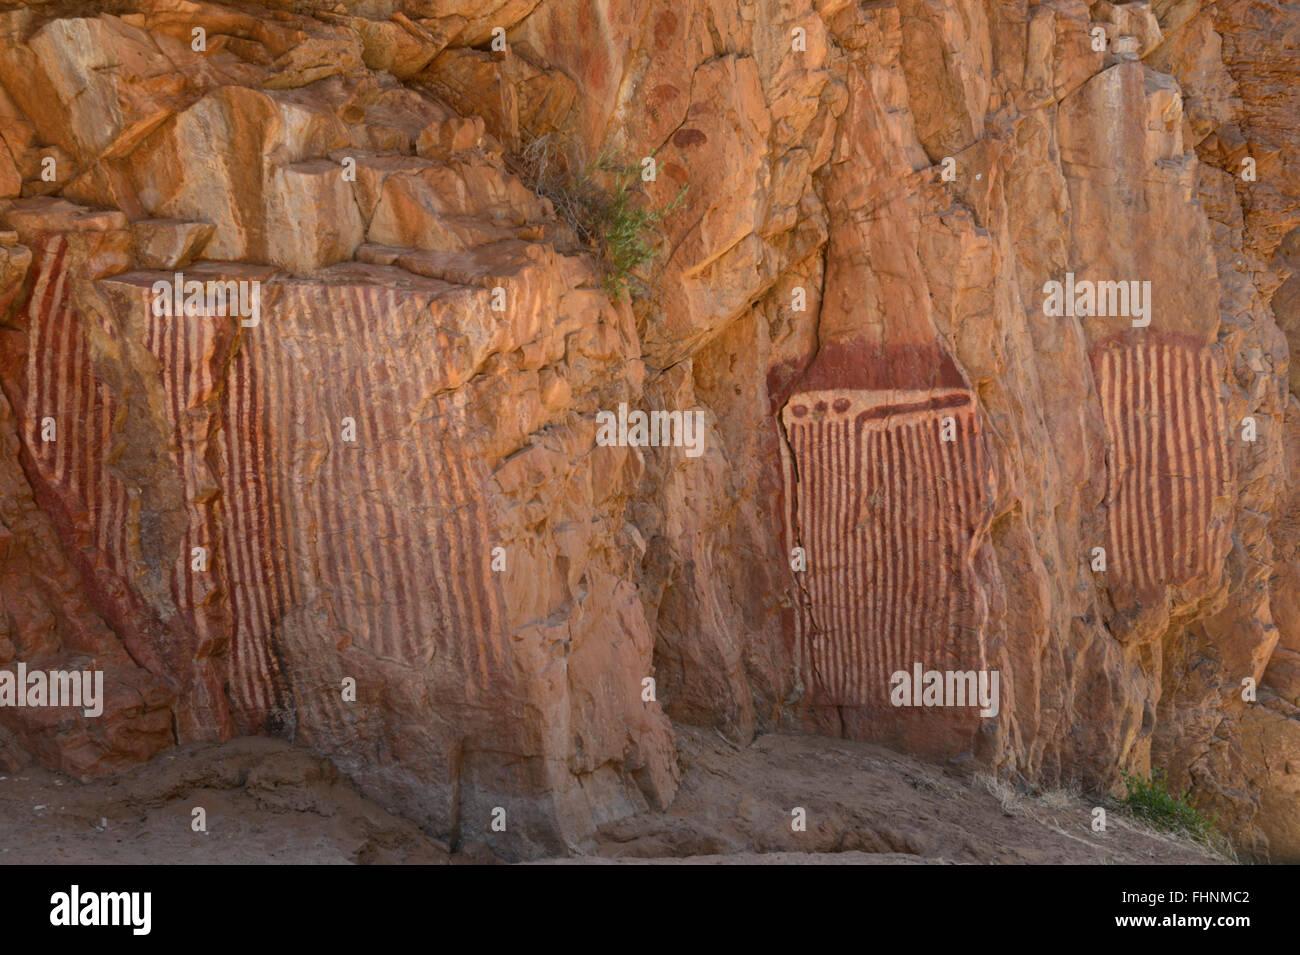 The Three Caterpillars, Aboriginal Rock Paintings, Emily Gap, MacDonnell Ranges, Northern Territory, Australia - Stock Image